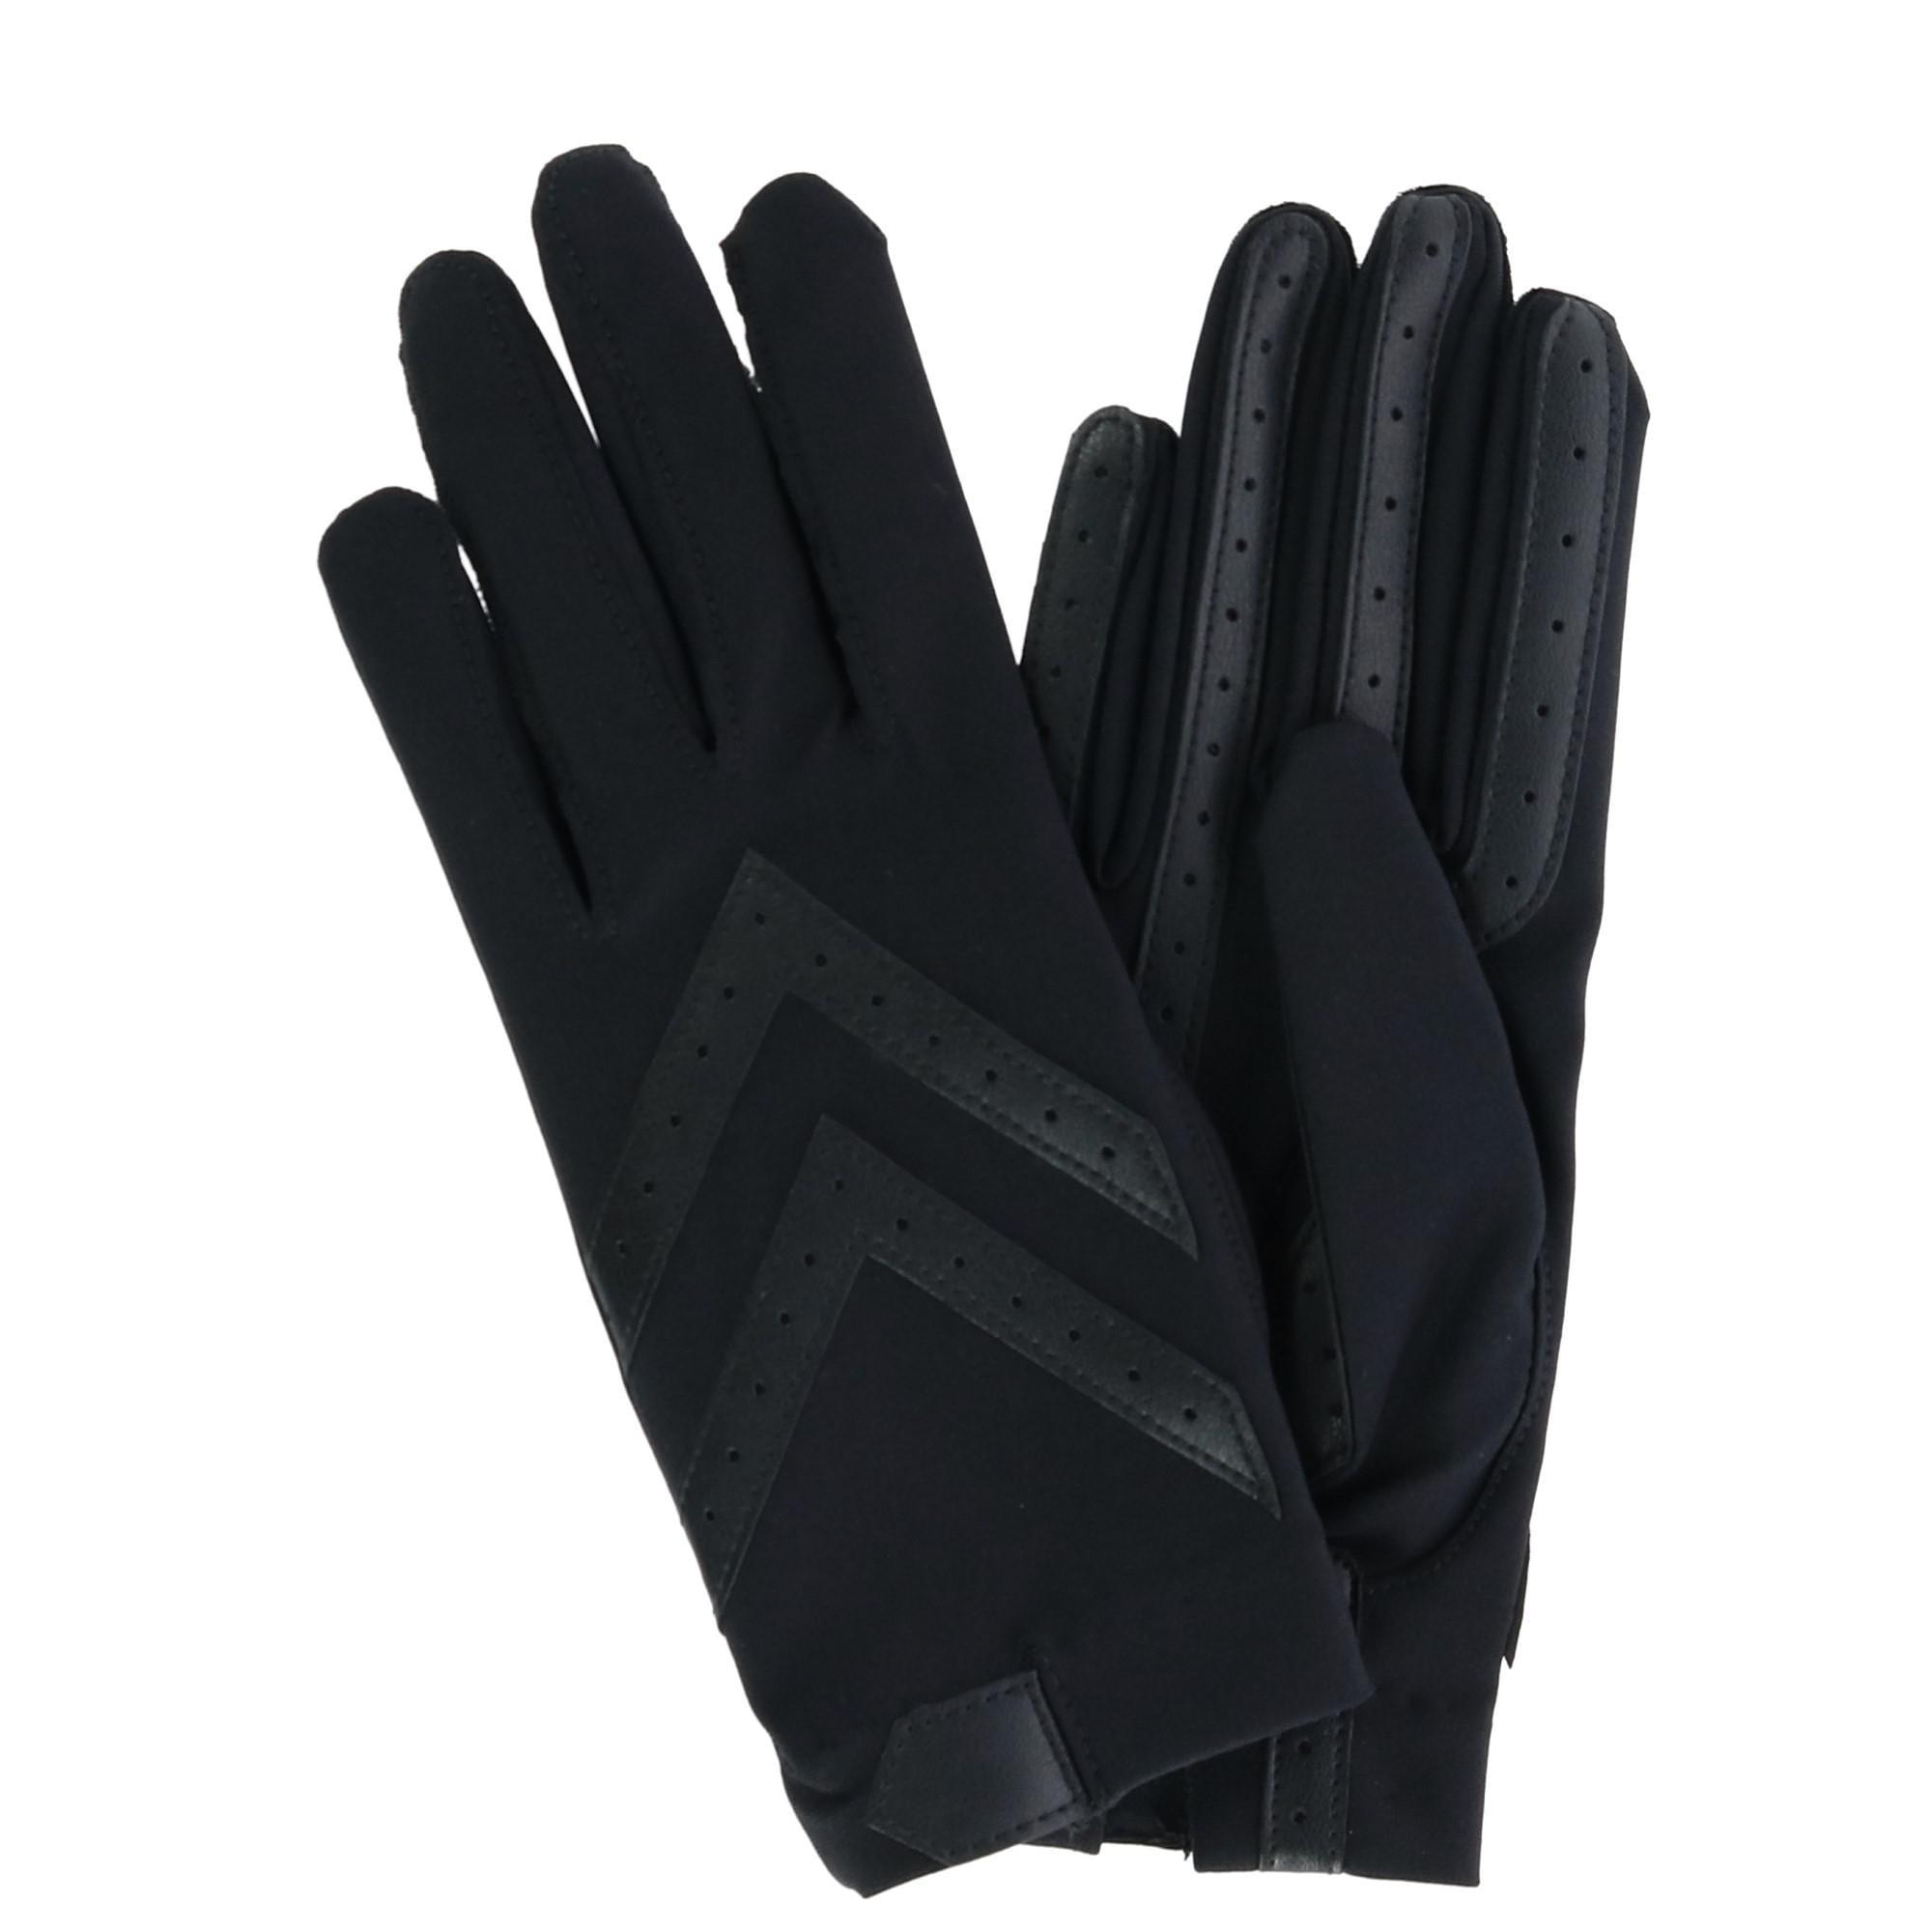 6cdbf821b Buy Women's Gloves Online at Overstock | Our Best Gloves Deals